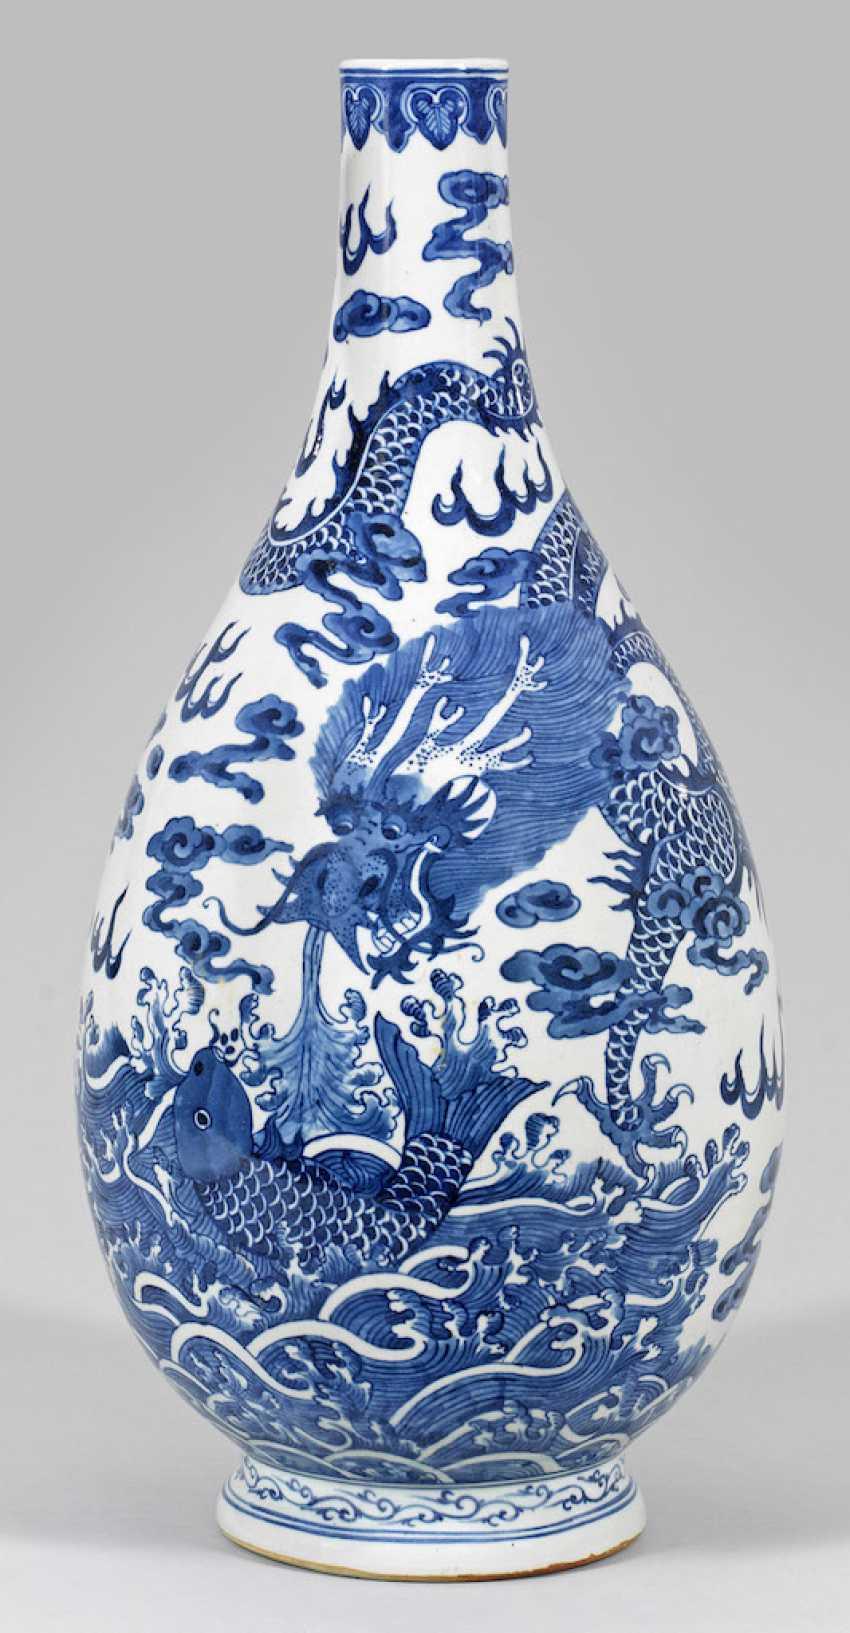 Large blue and white bottle vase with dragon decoration - photo 1